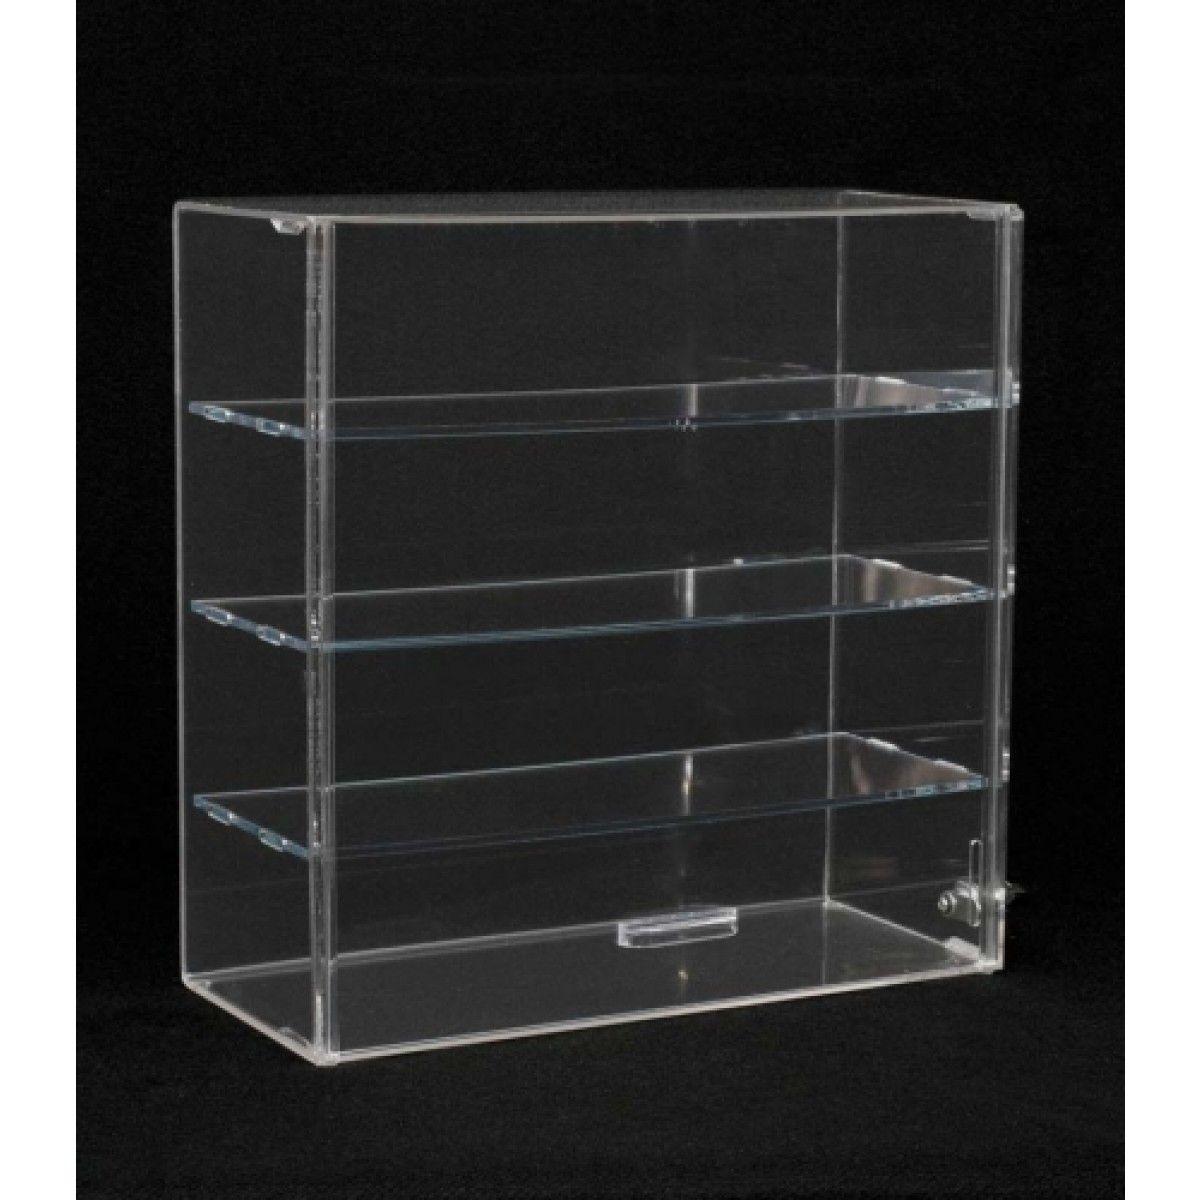 Acrylic Case Display Acrylic Countertop Display Case With Sliding